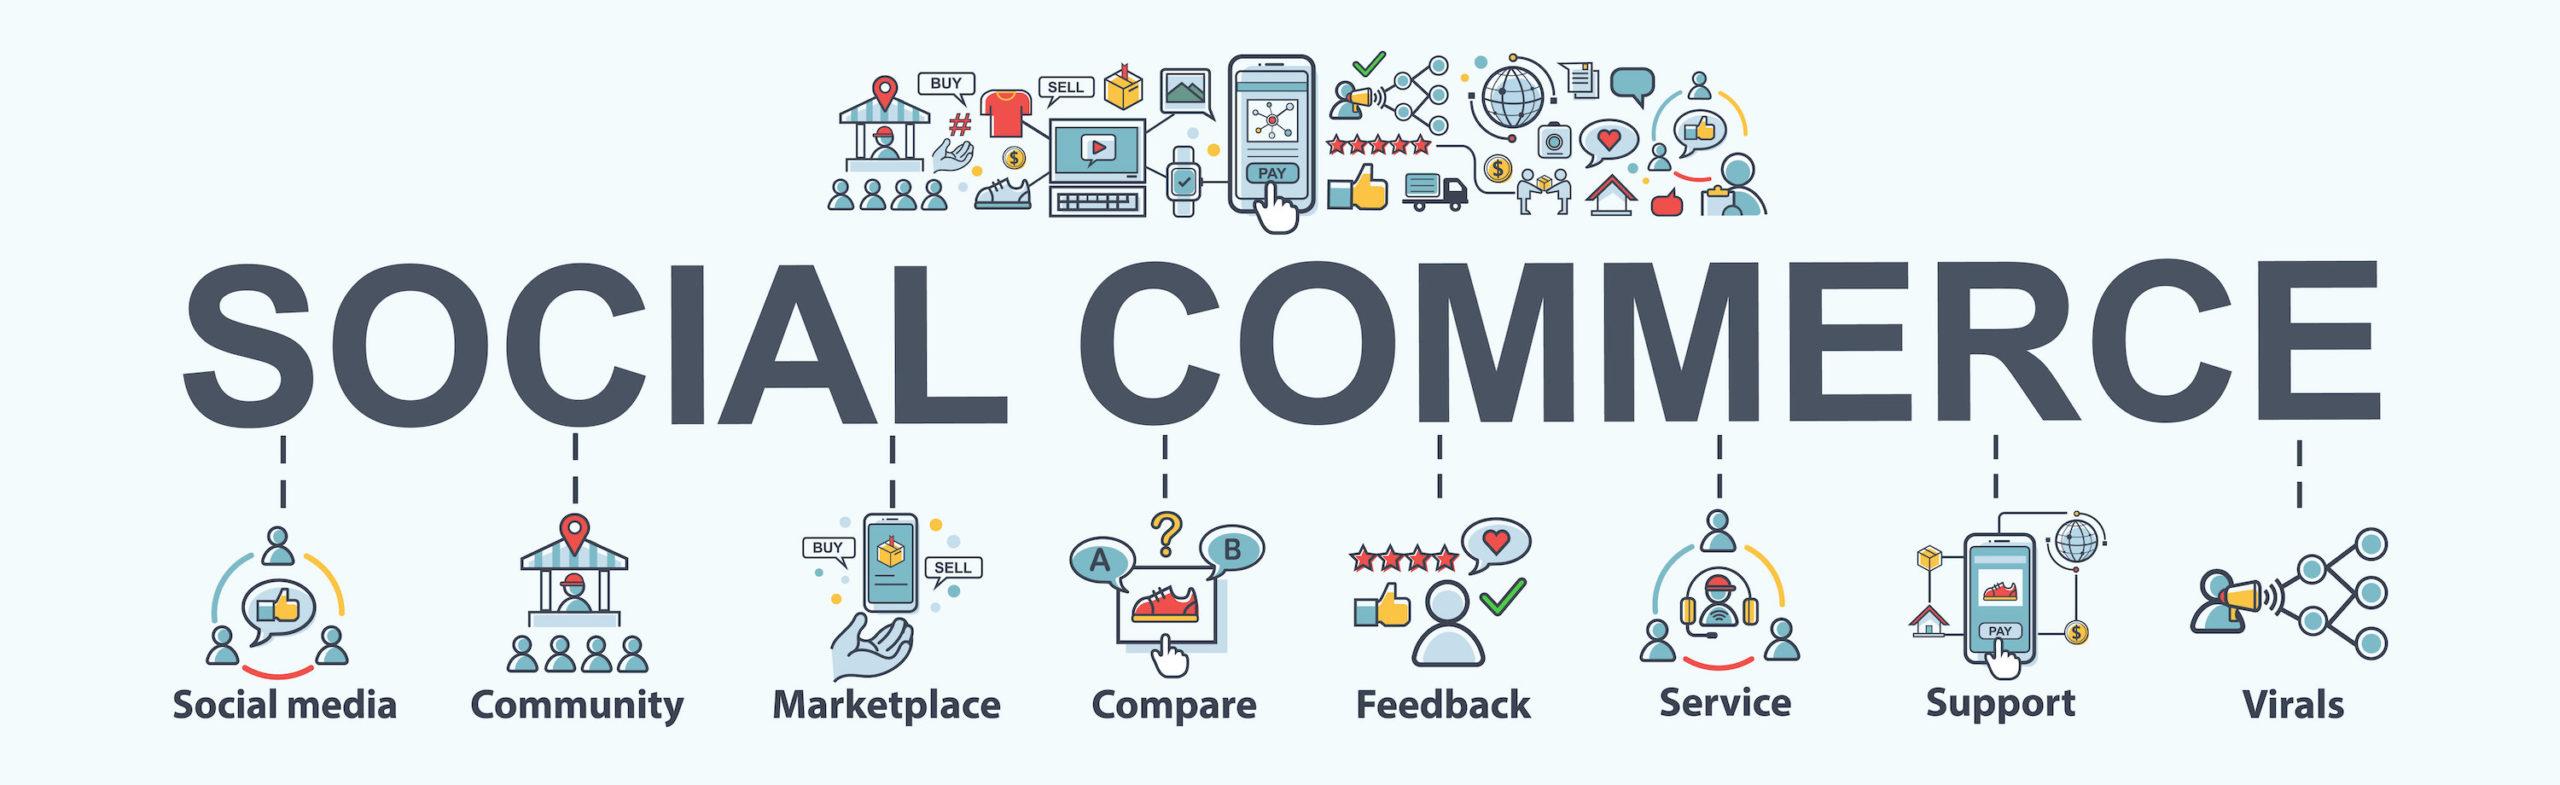 Infographic zum Thema Social Commerce